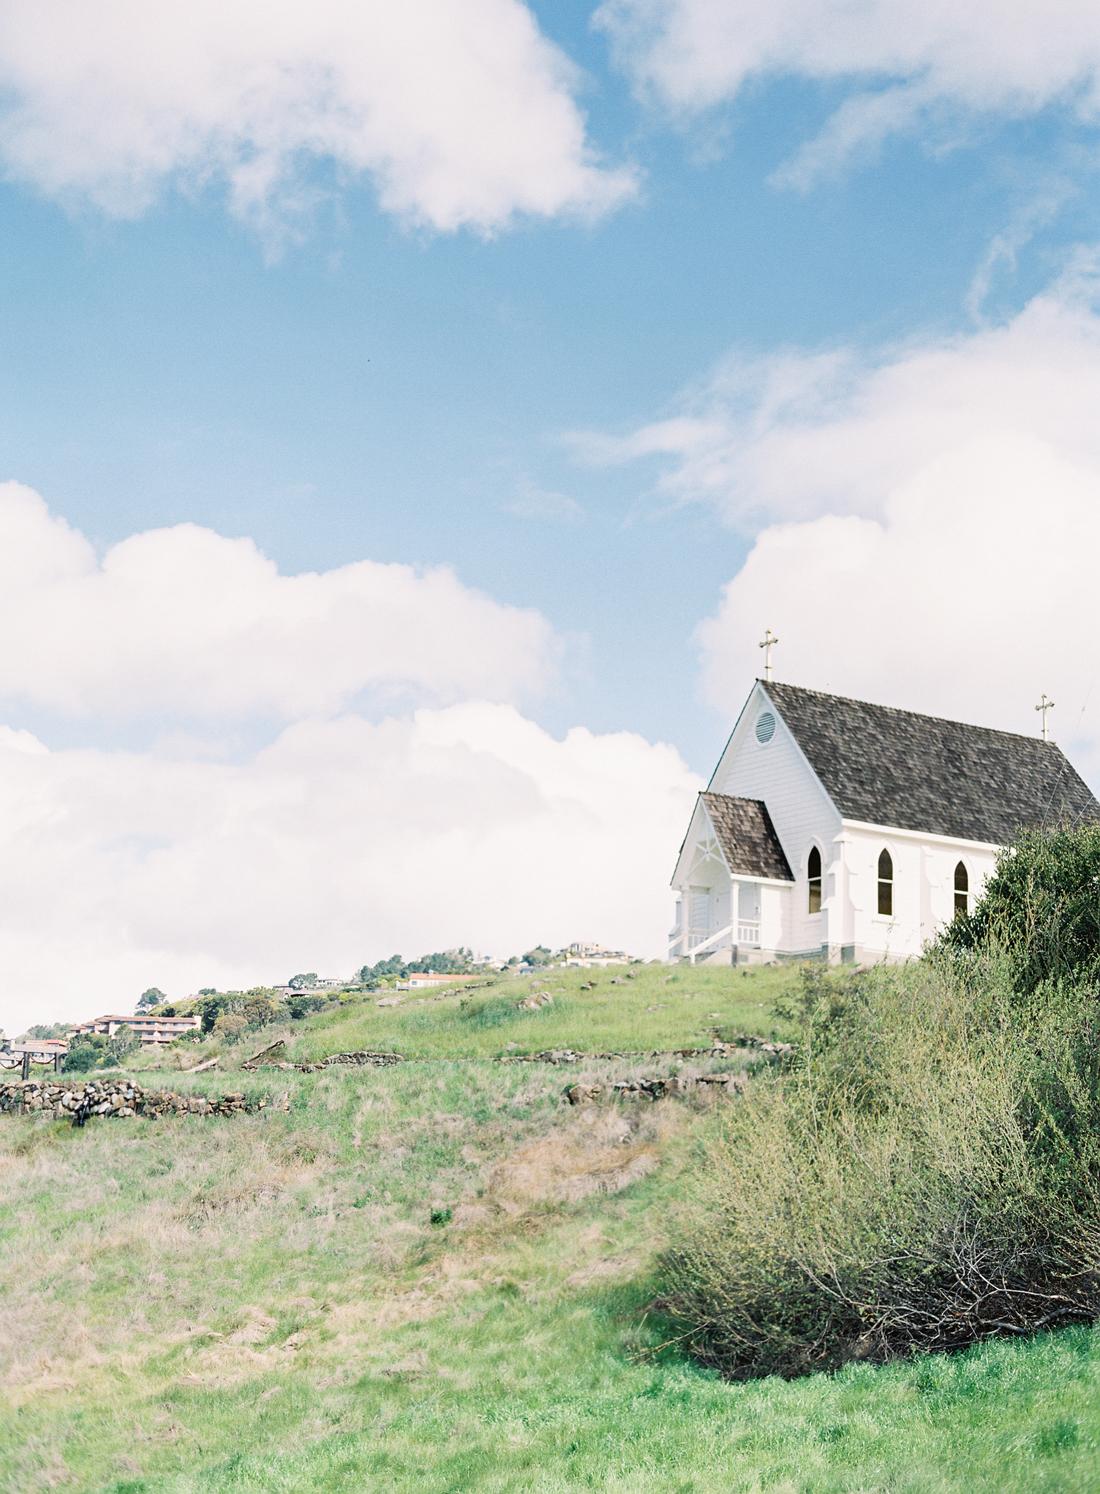 petite white church on top a grassy hill